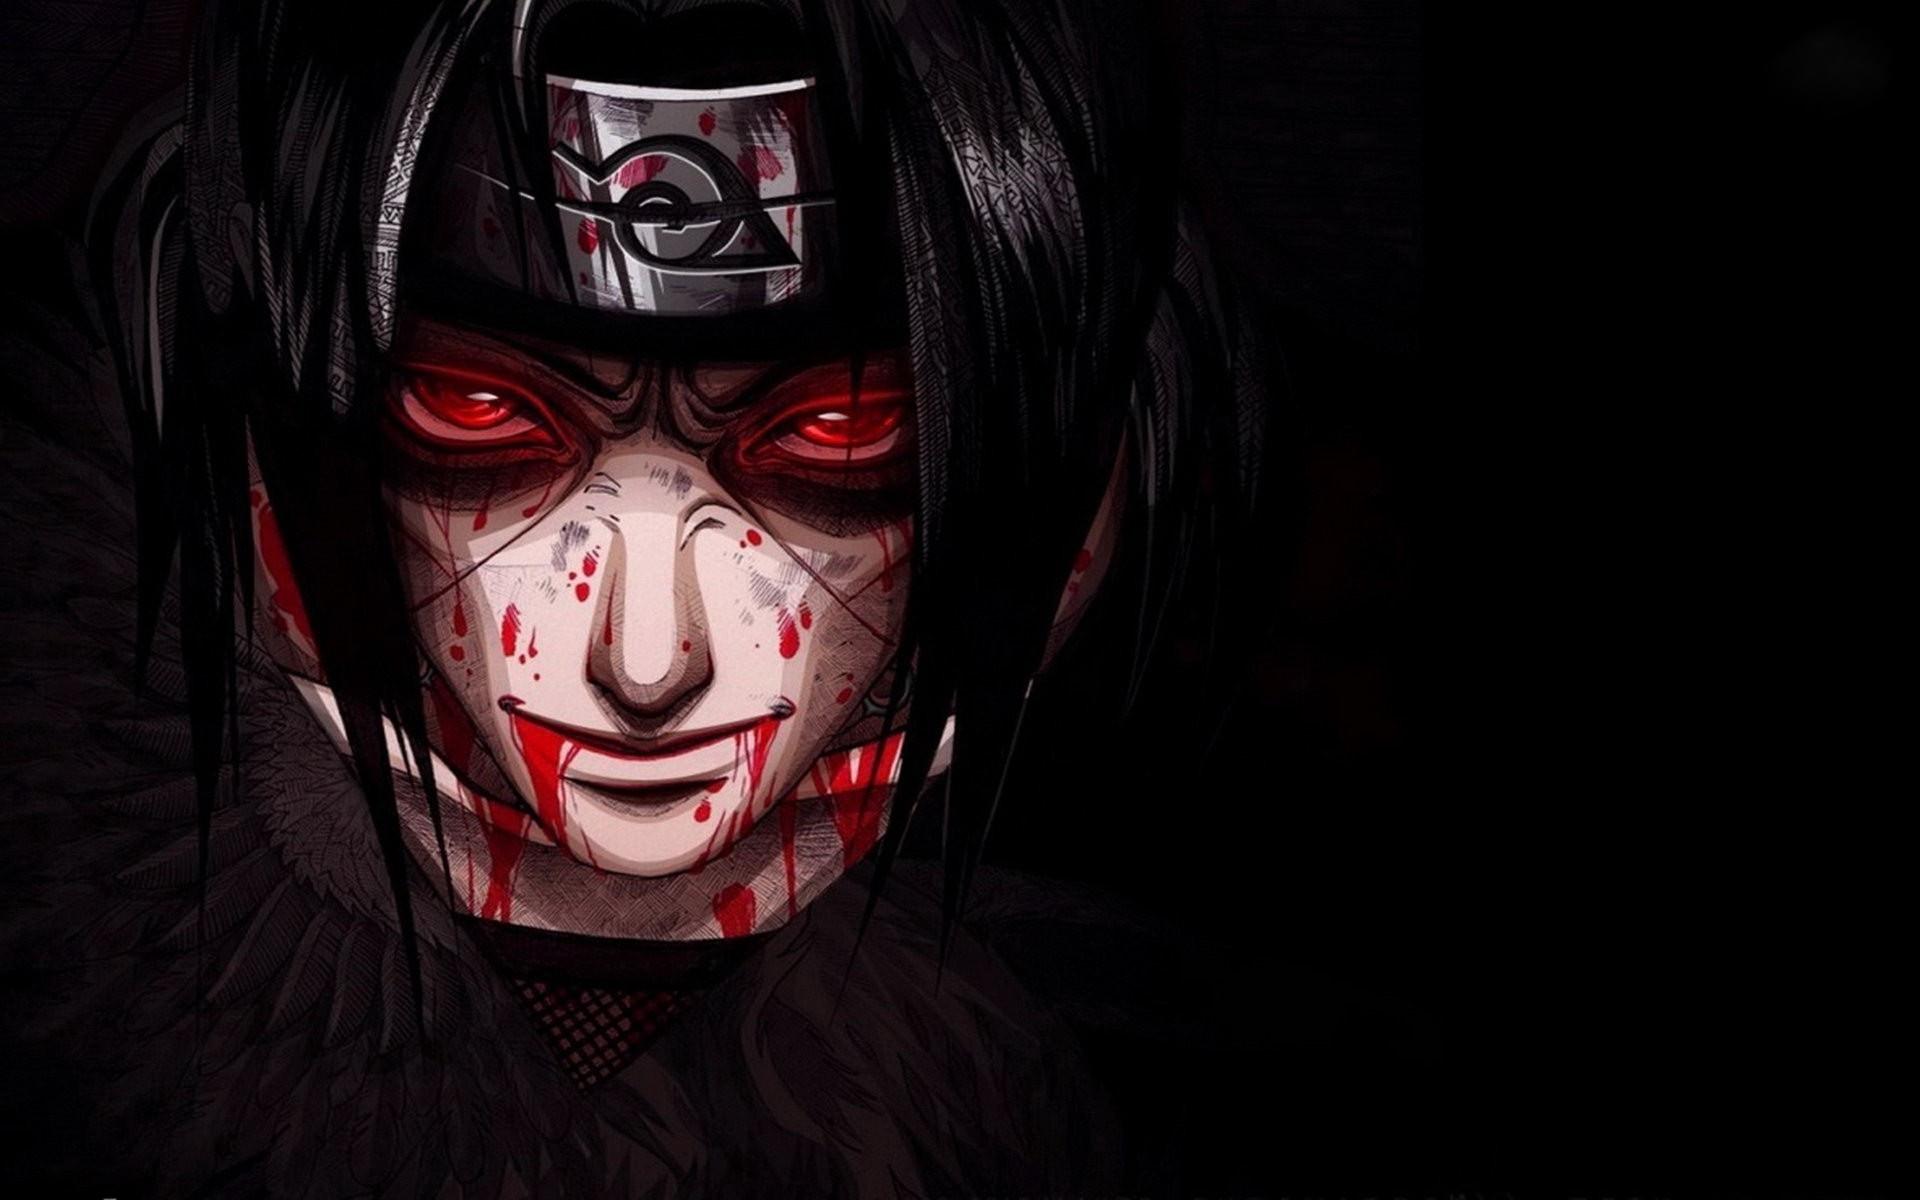 Wonderful Wallpaper Halloween Naruto - 505017  Trends_37525.jpg